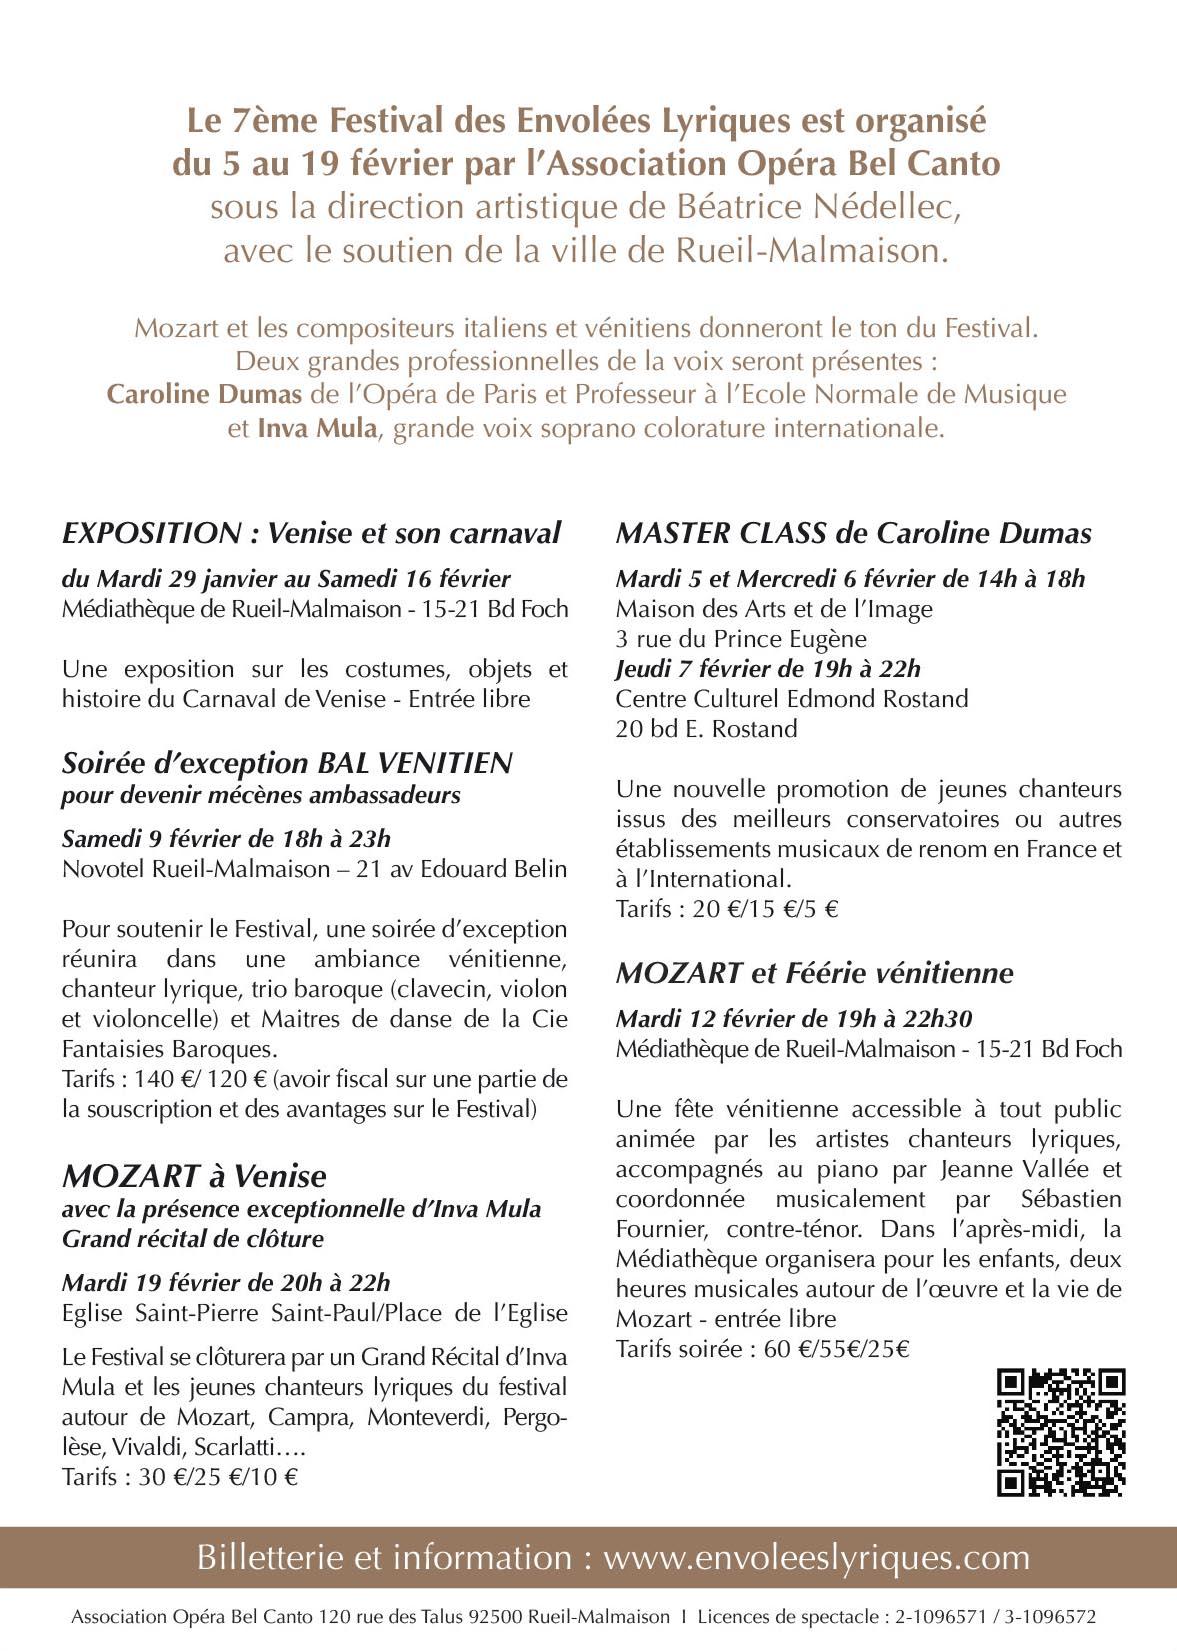 Programme | Association Opéra Bel Canto | Festival Les